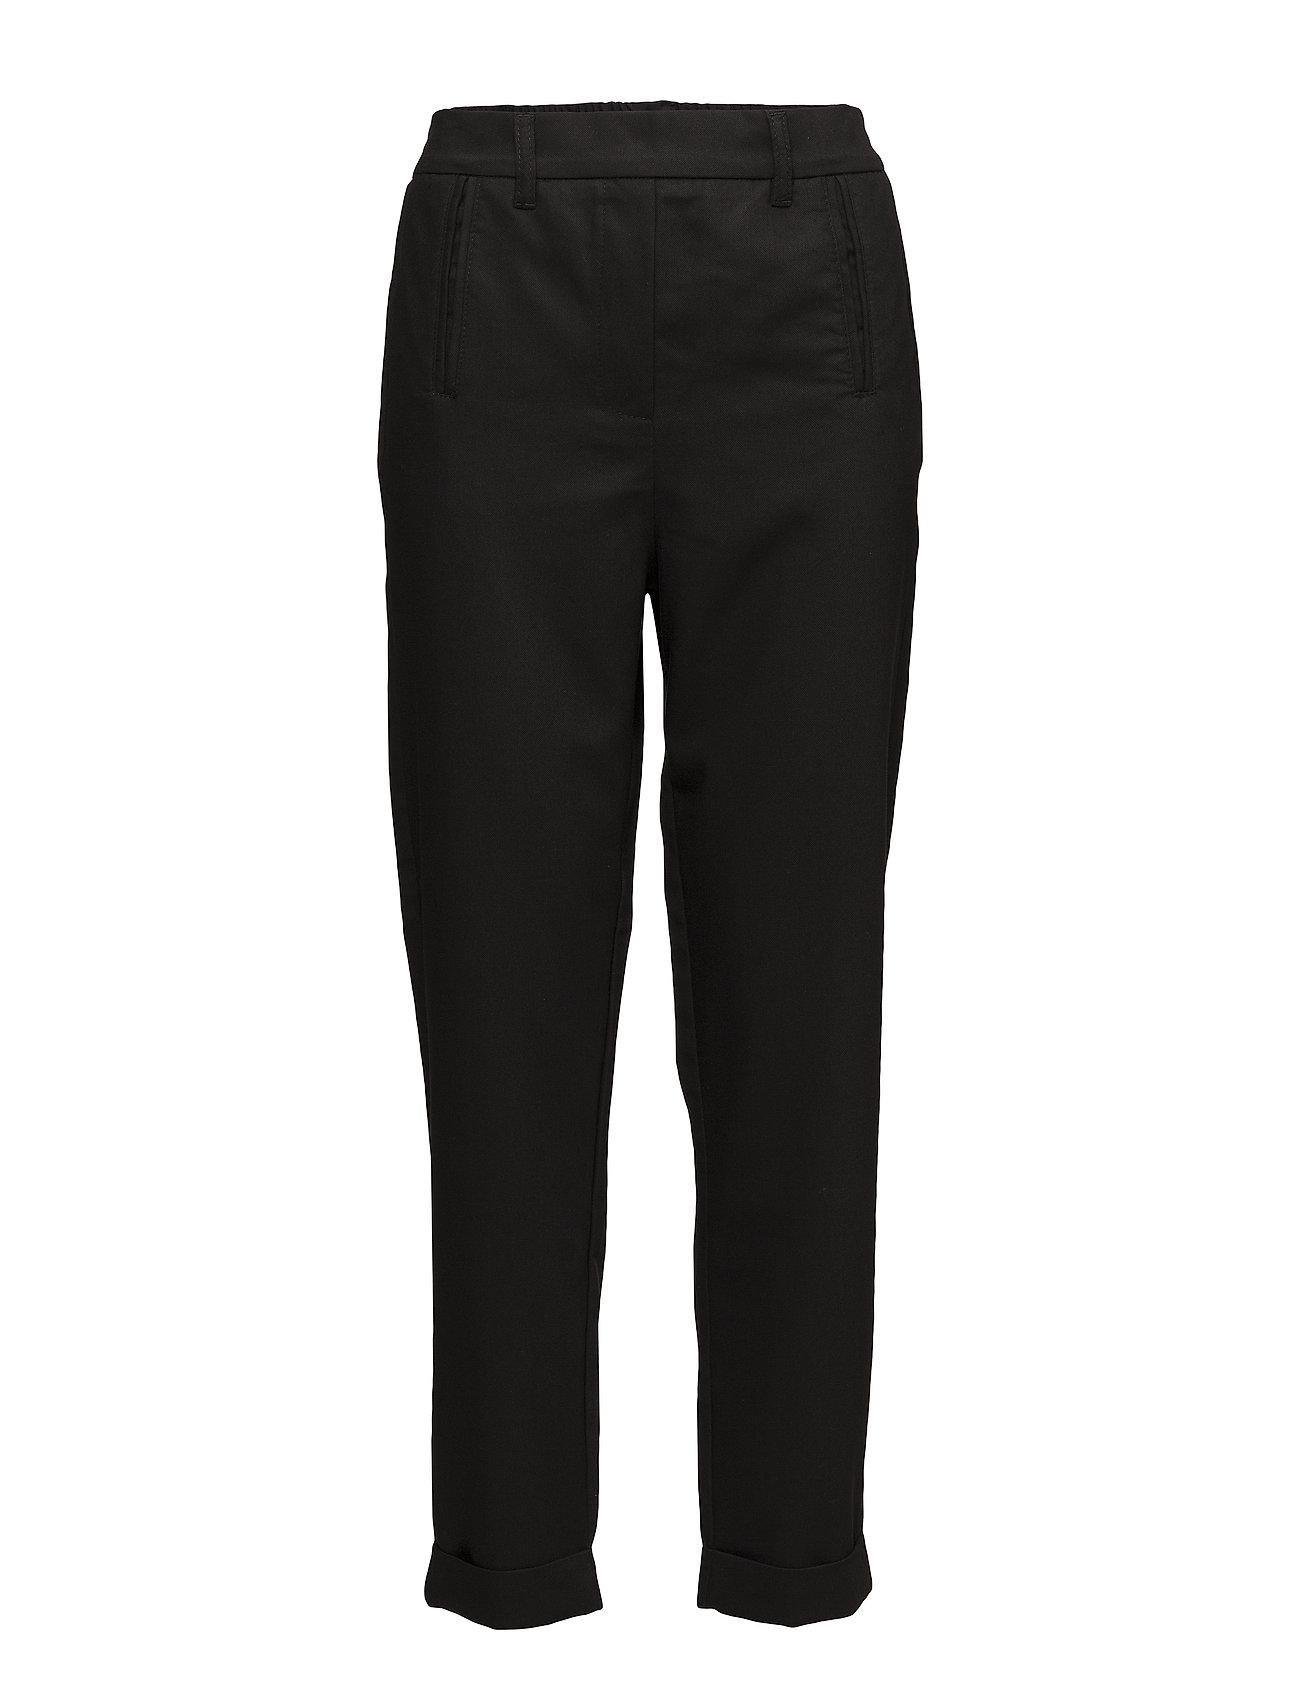 2nd One Anne 012 Pants - BLACK GRAIN